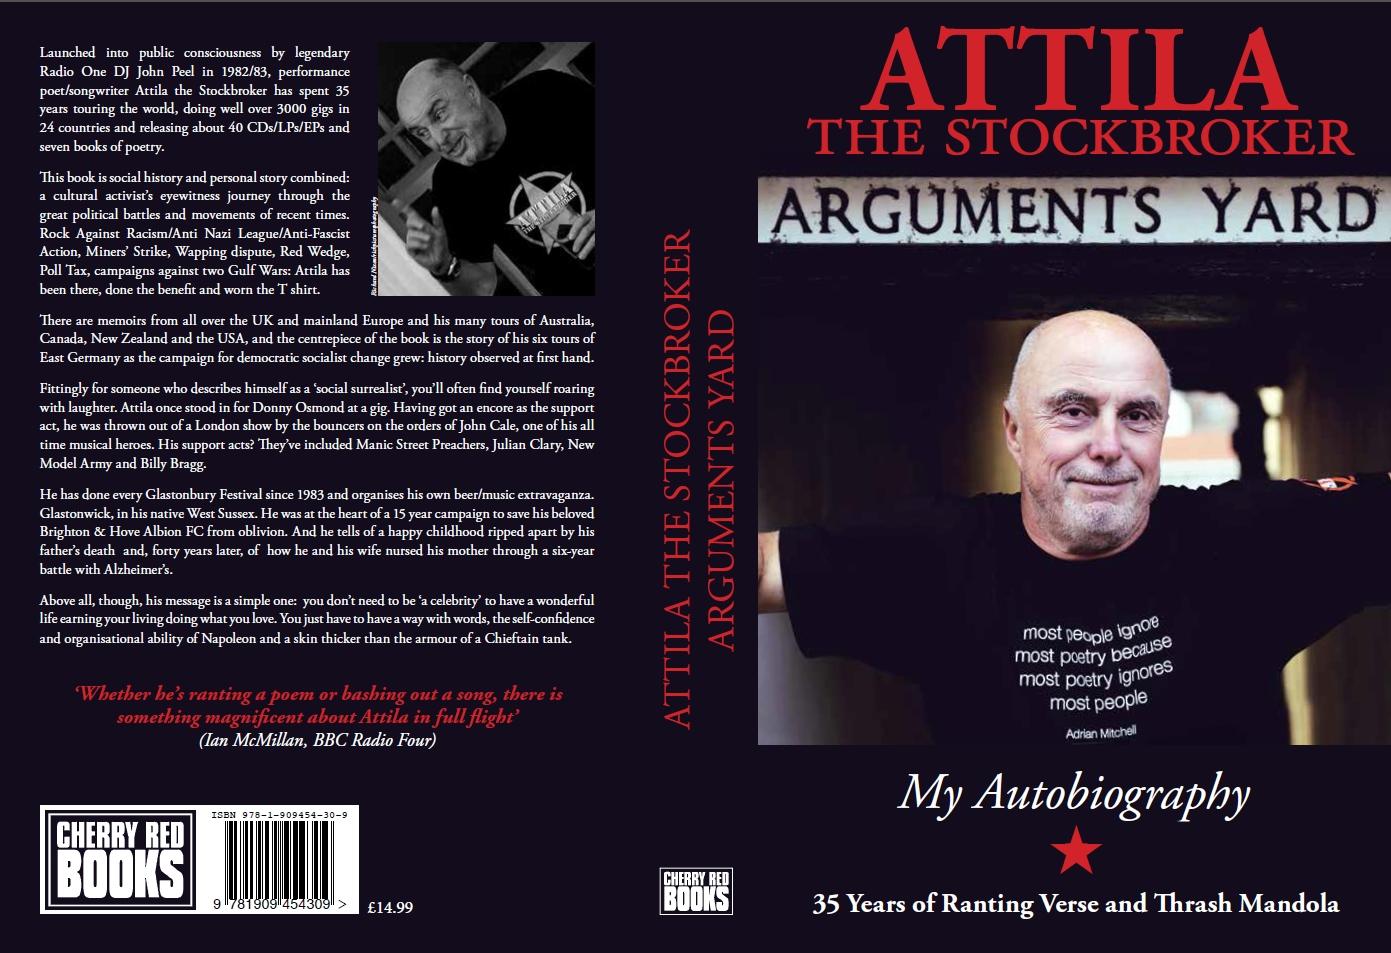 Attila the Stockbroker - Performance poet - poetry - poems